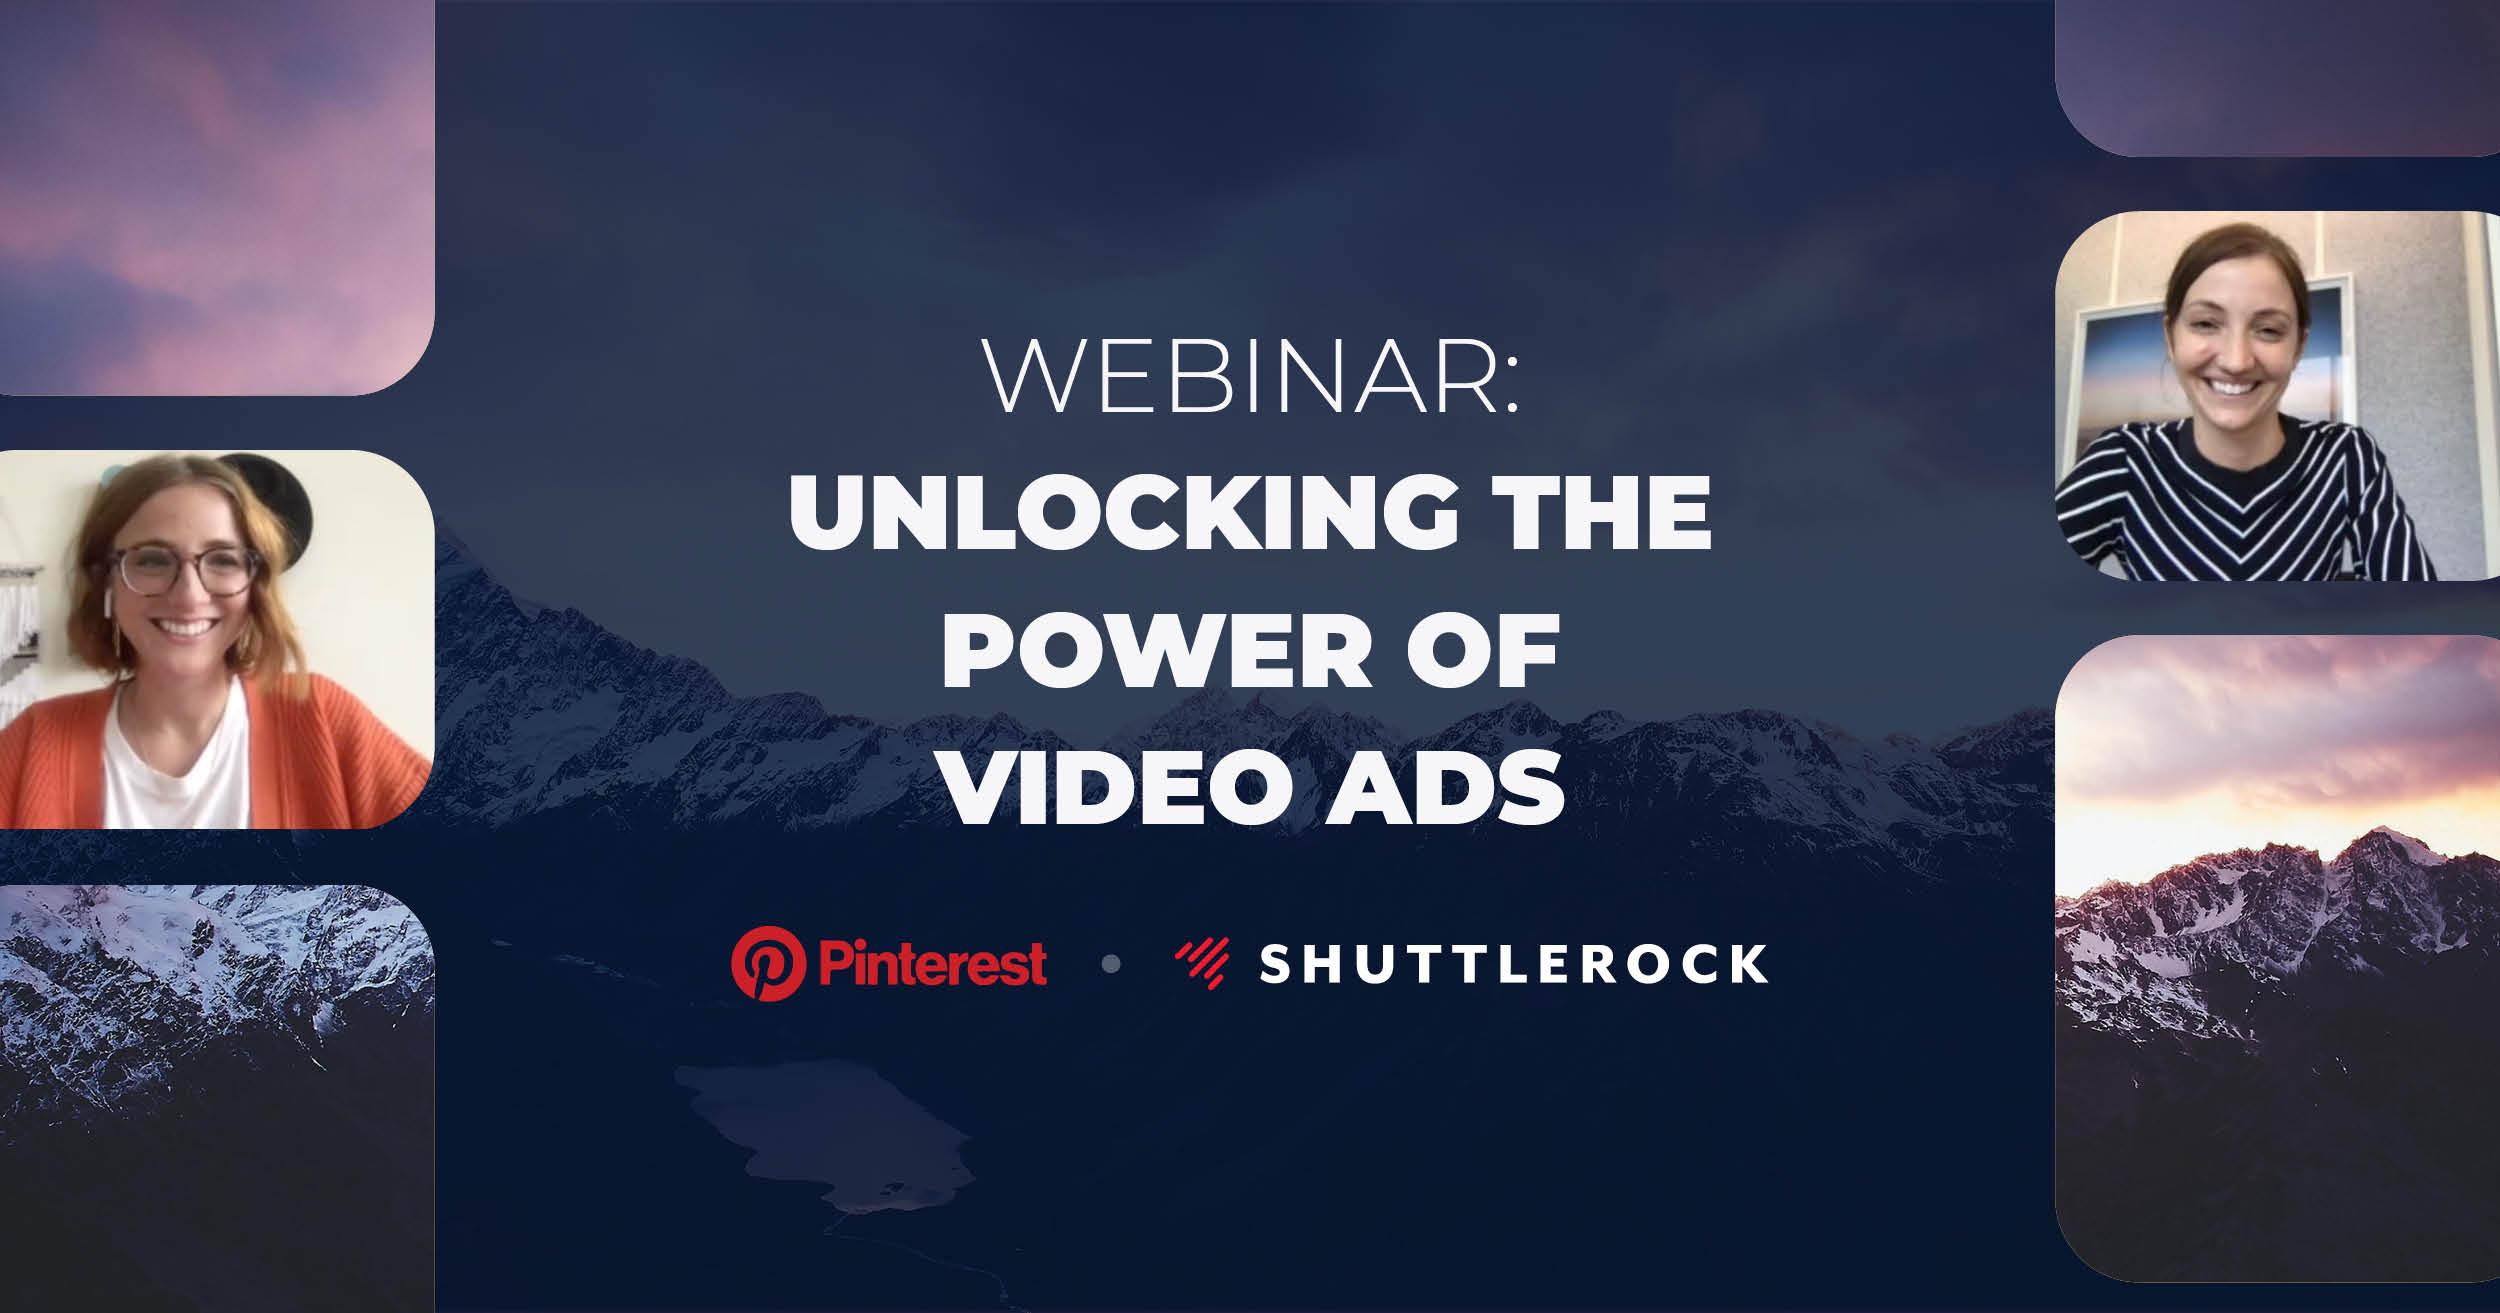 Pinterest + Shuttlerock: Unlocking The Power Of Video Ads